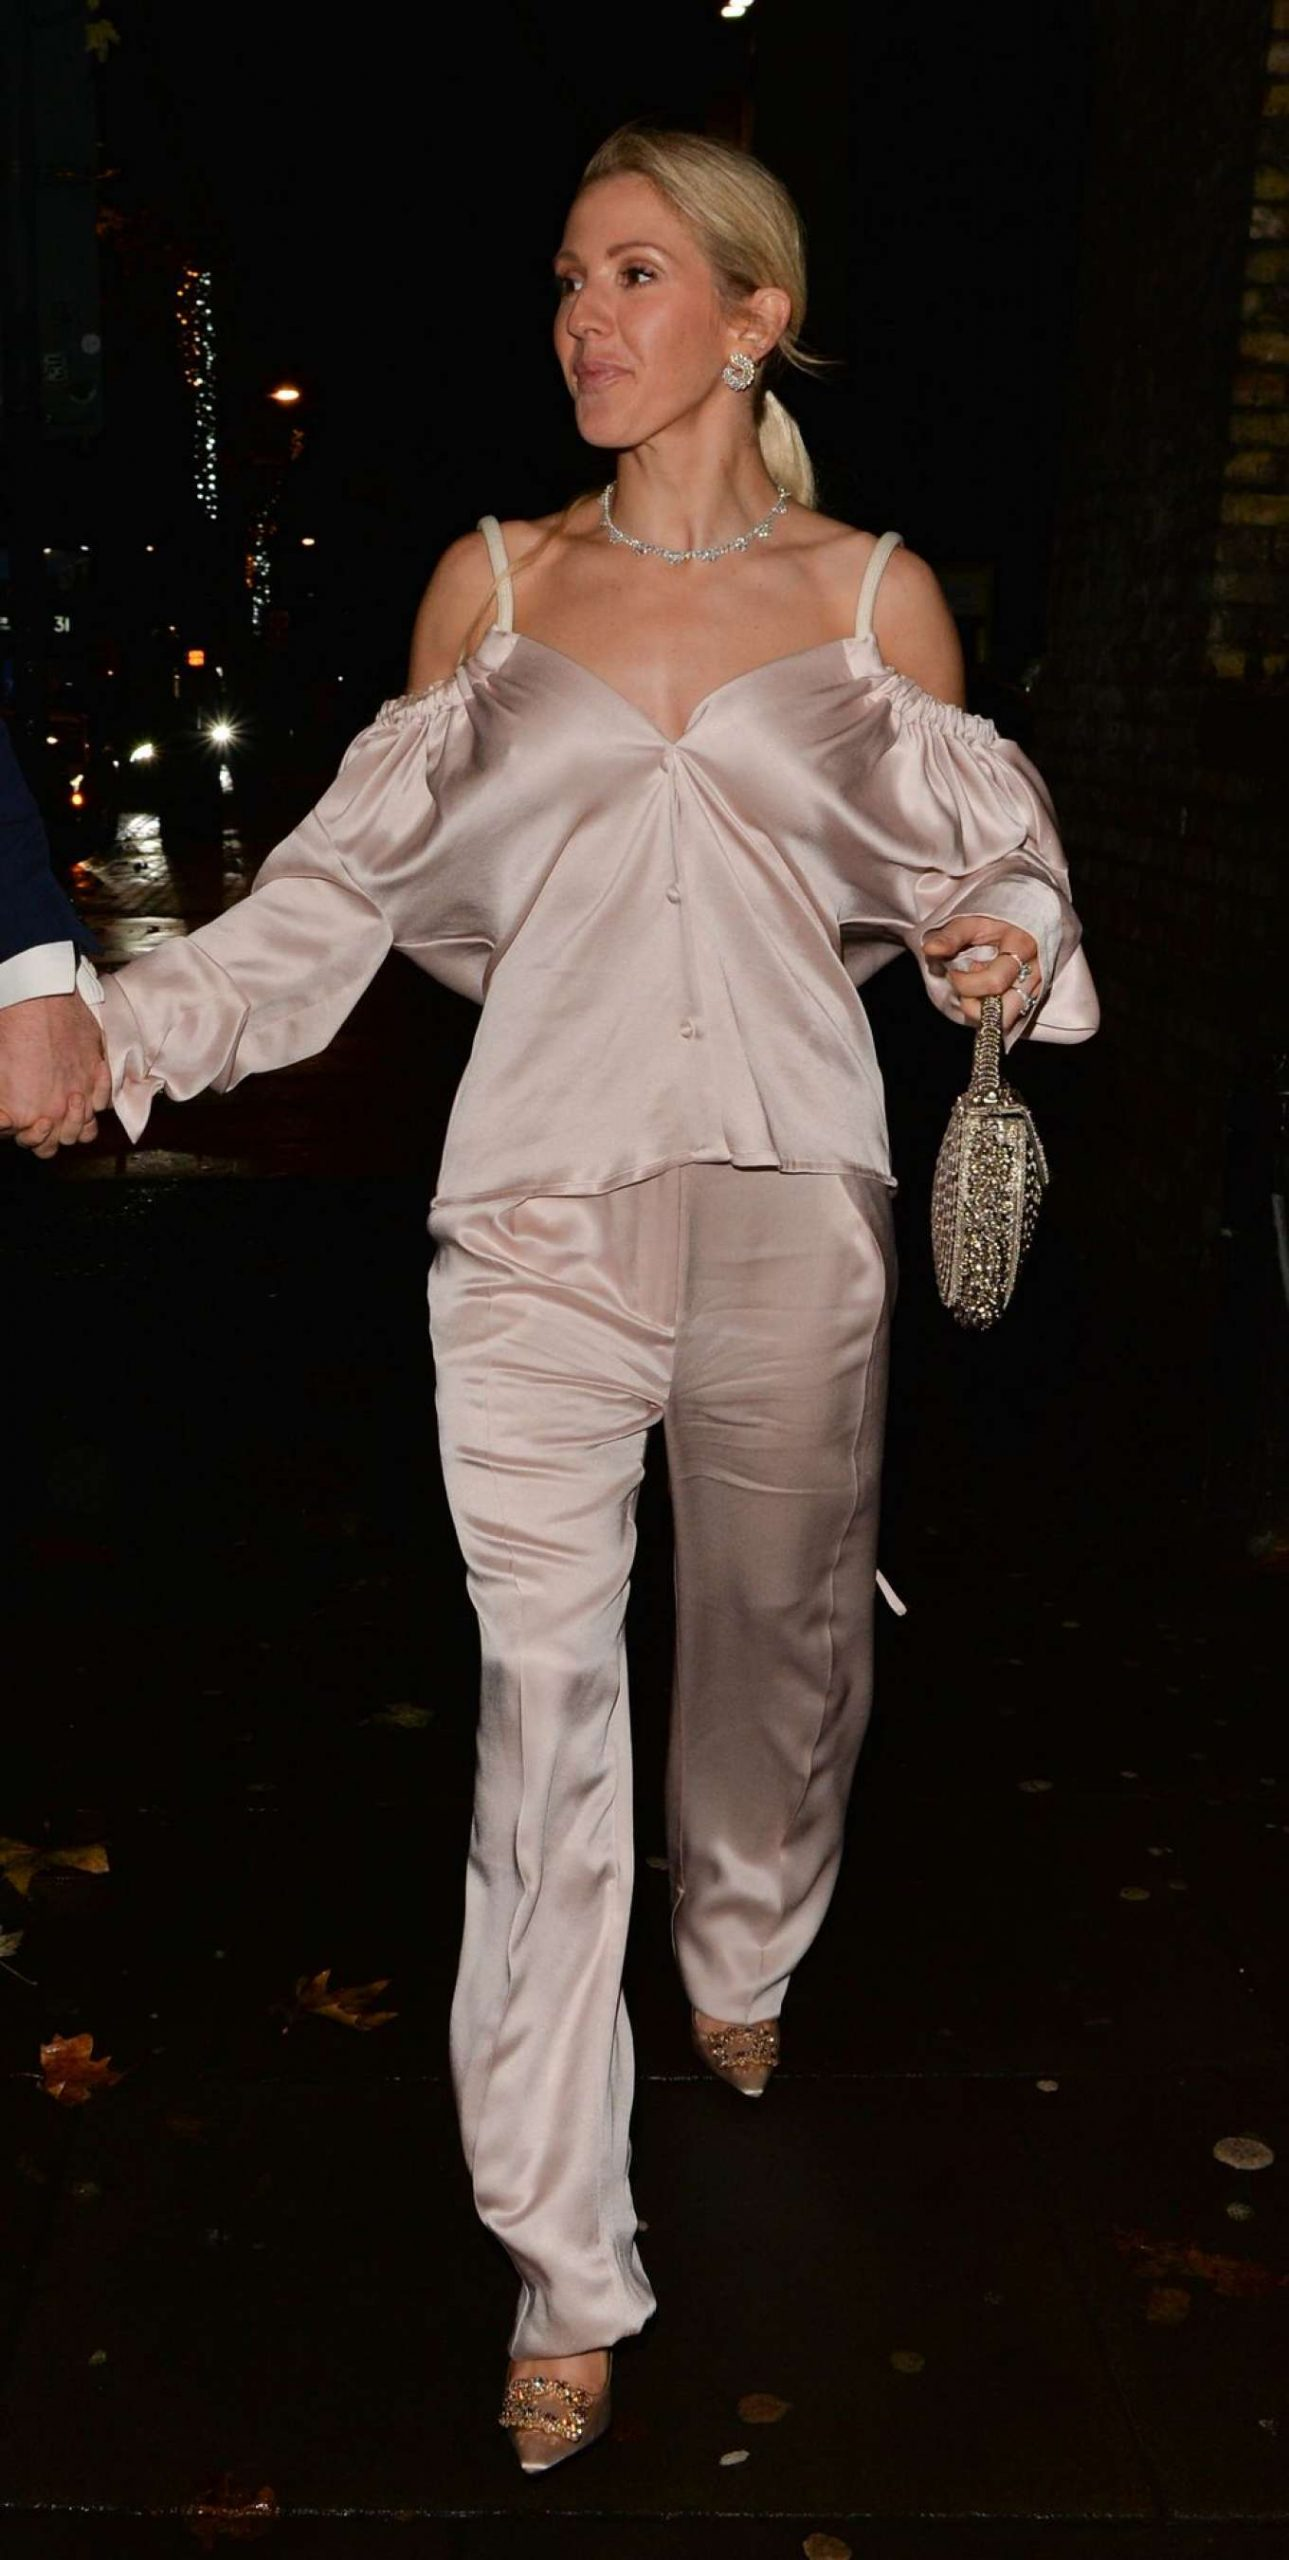 Ellie Goulding 2019 : Ellie Goulding and her husband Jaspar Copling were seen leaving the Roundhouse in Camden – London-06